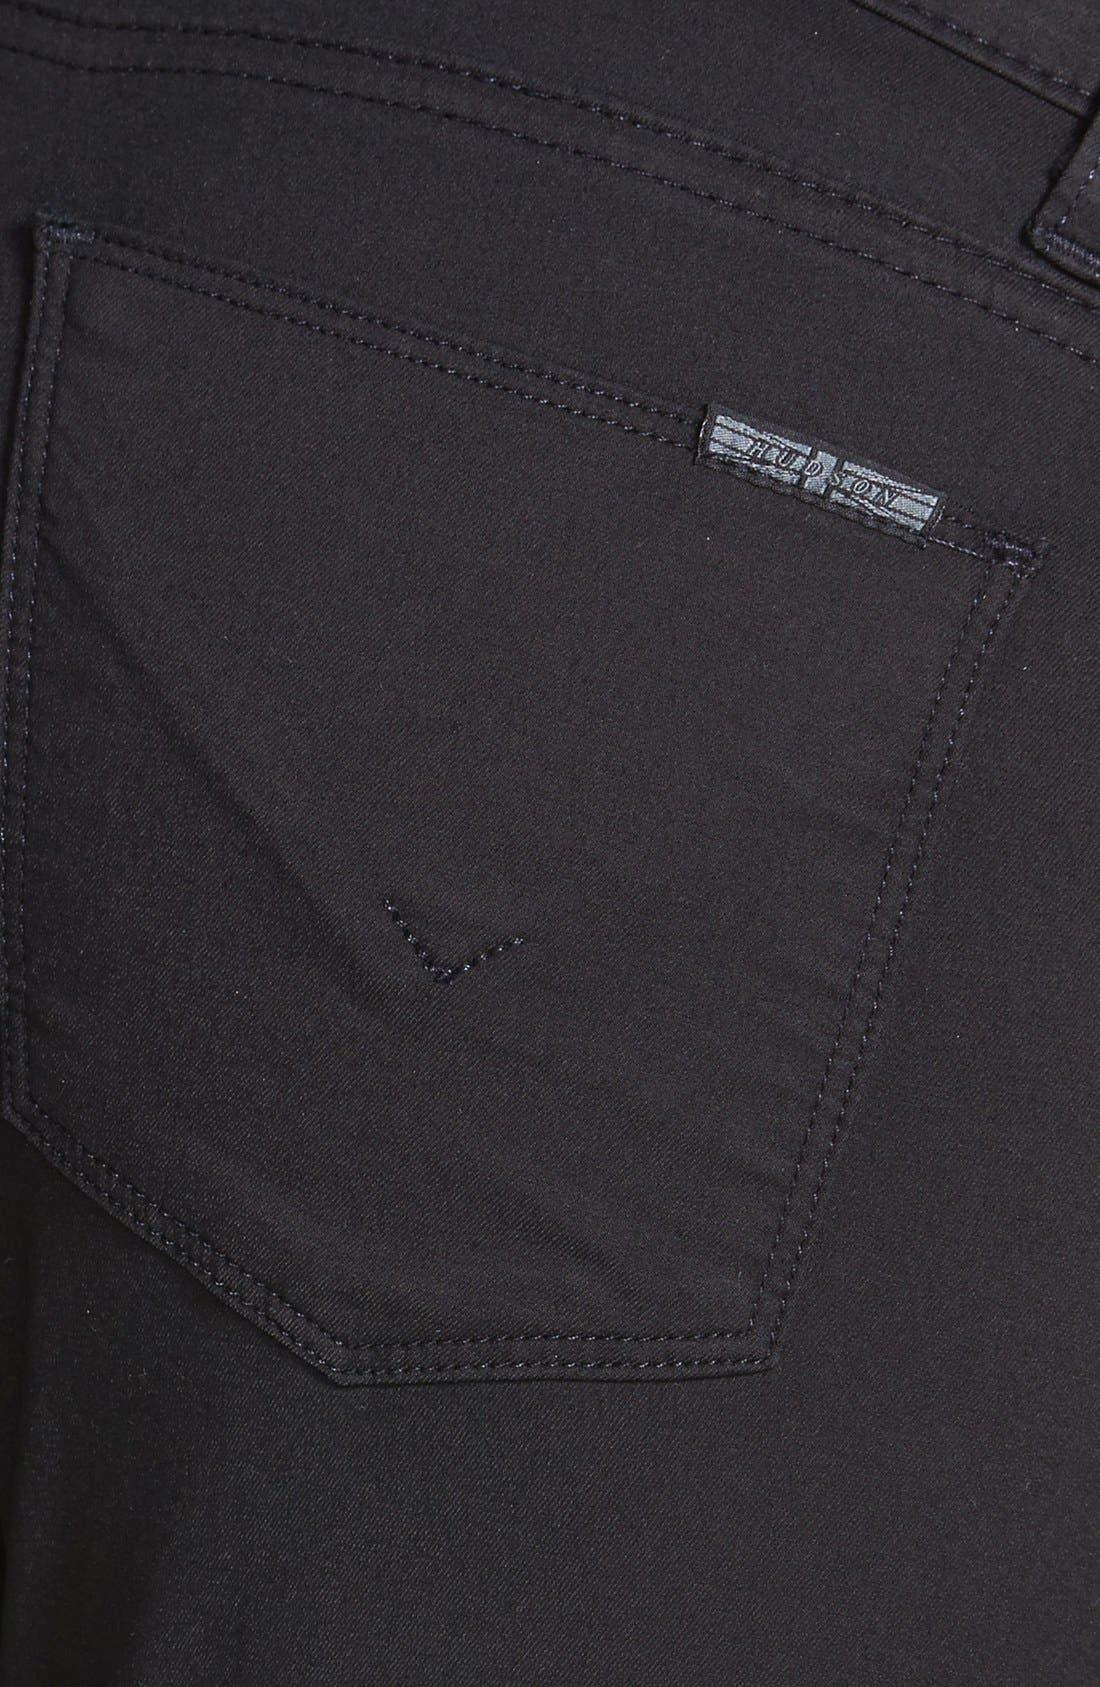 Alternate Image 3  - Hudson Jeans 'Nico' Super Skinny Jeans (Melancholy)